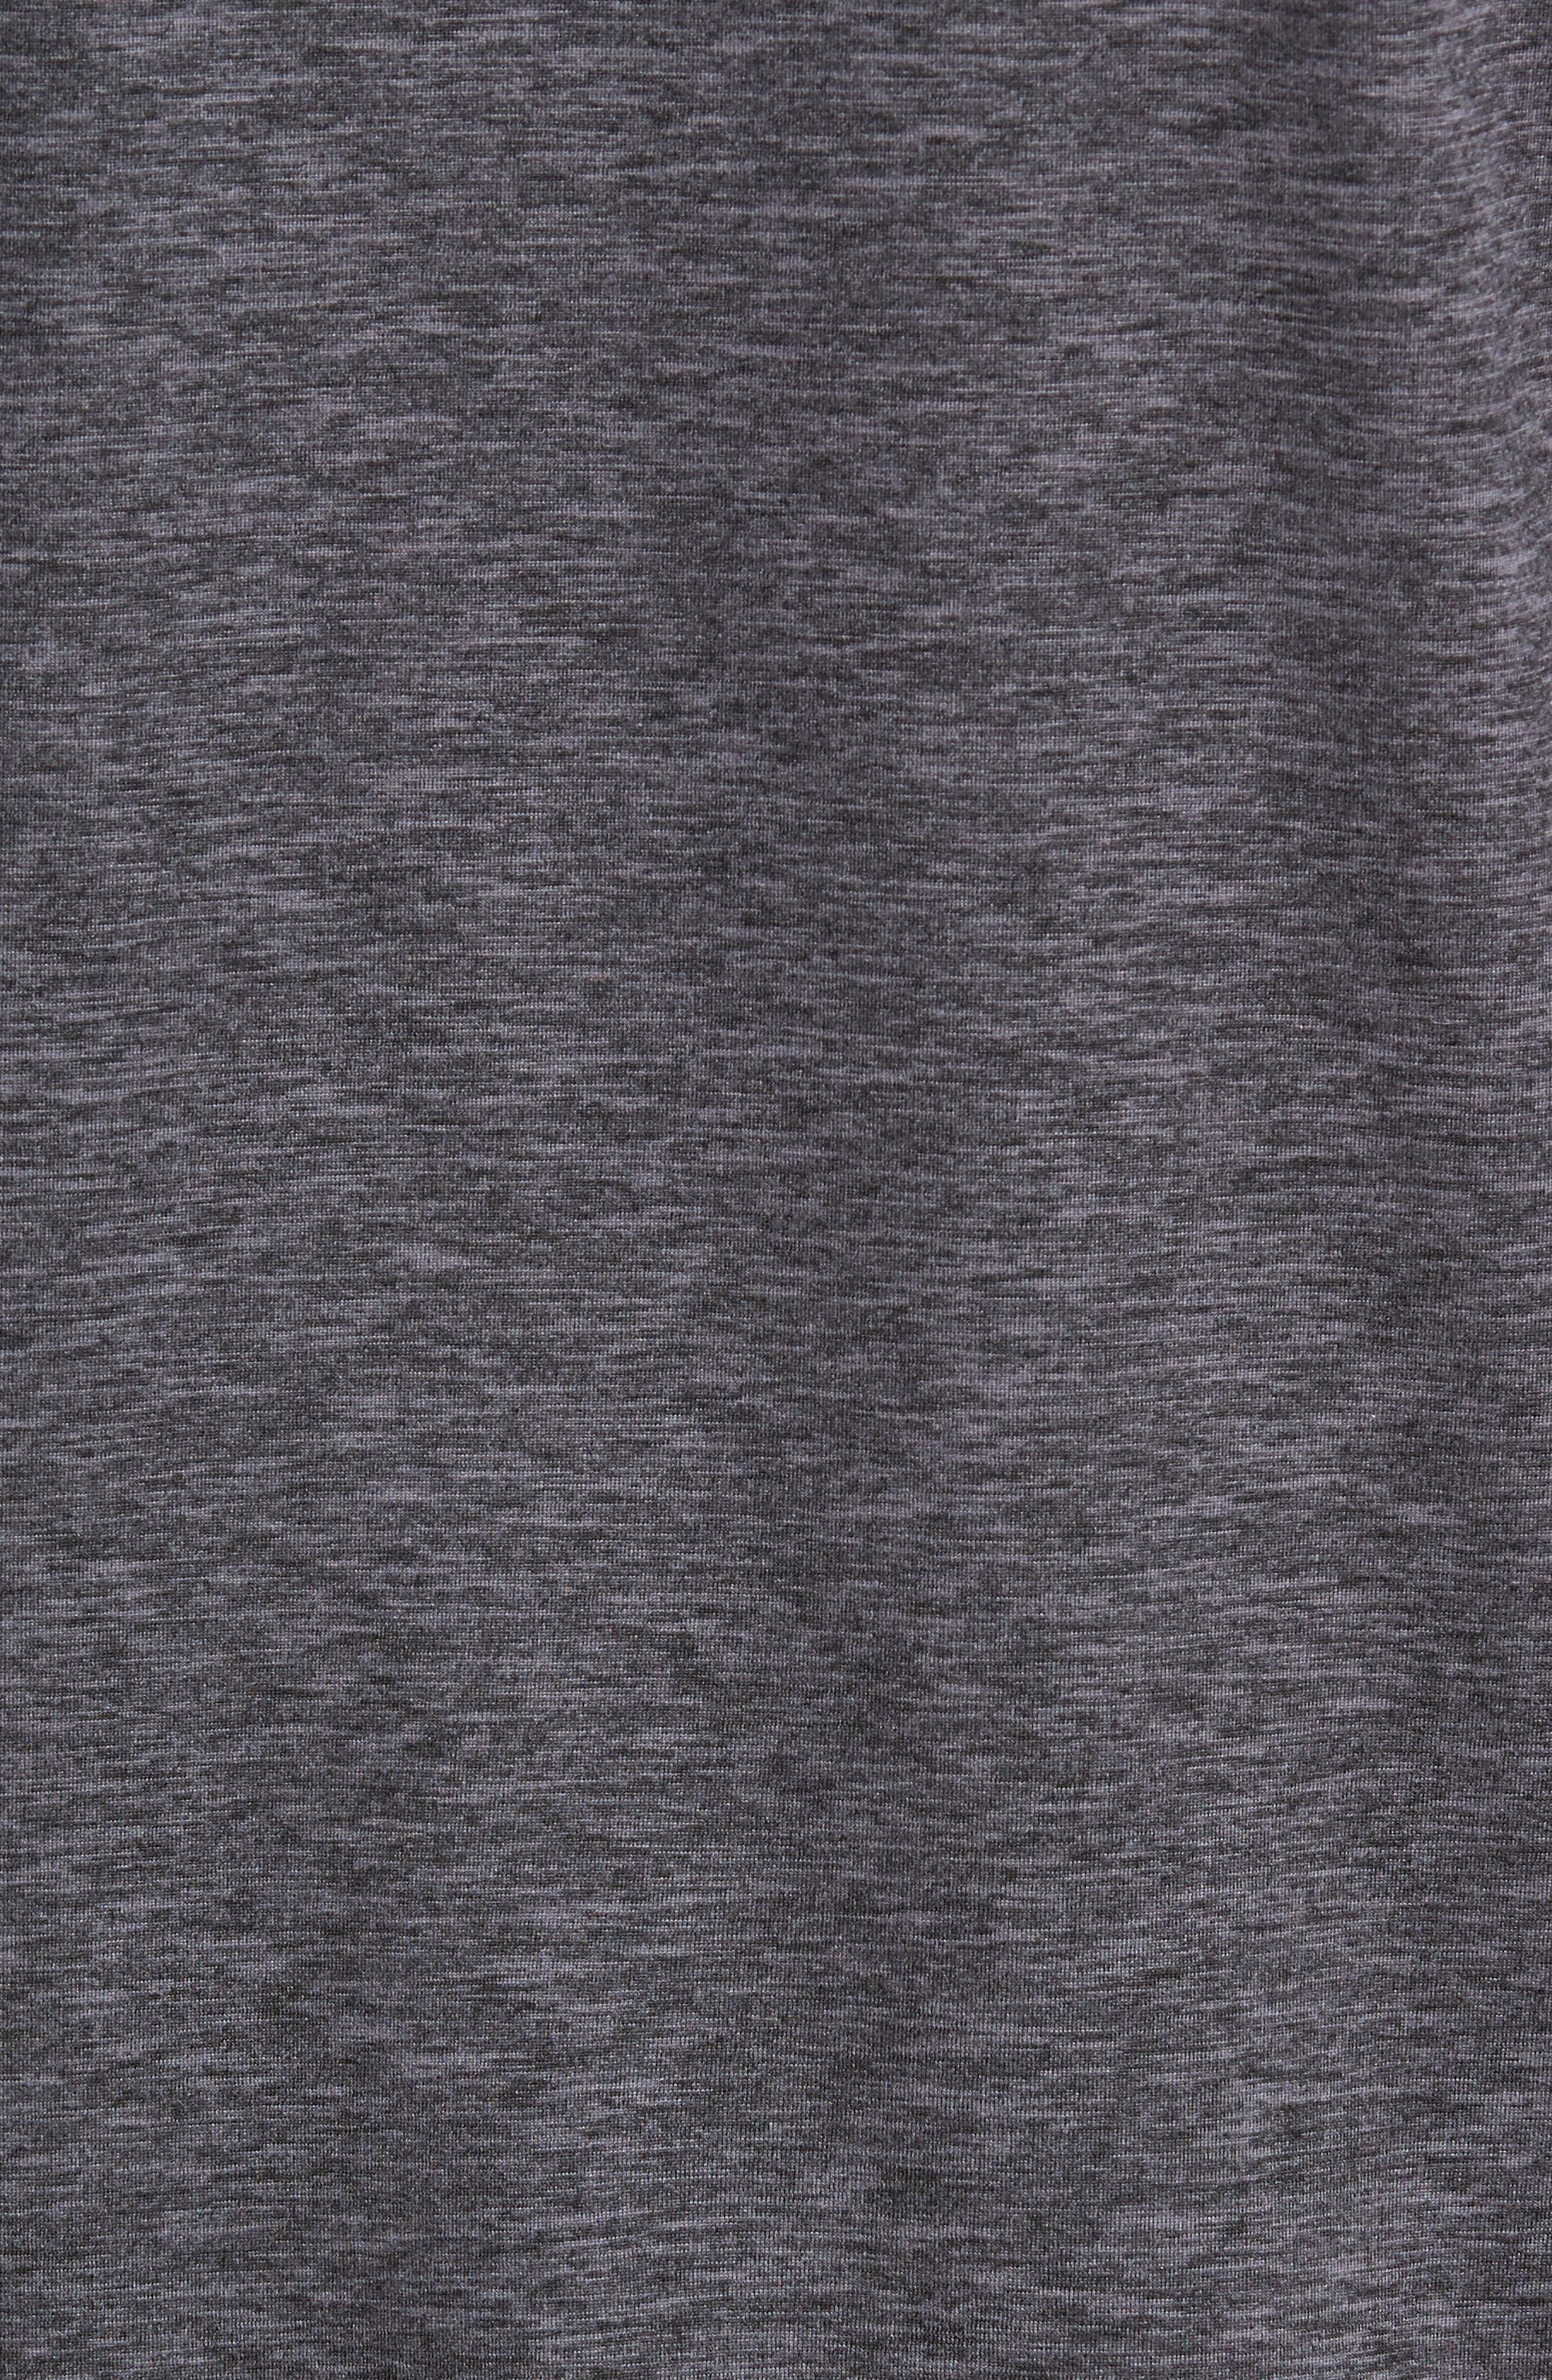 Bornite Pullover Hoodie,                             Alternate thumbnail 5, color,                             BLACK OXIDE MELANGE